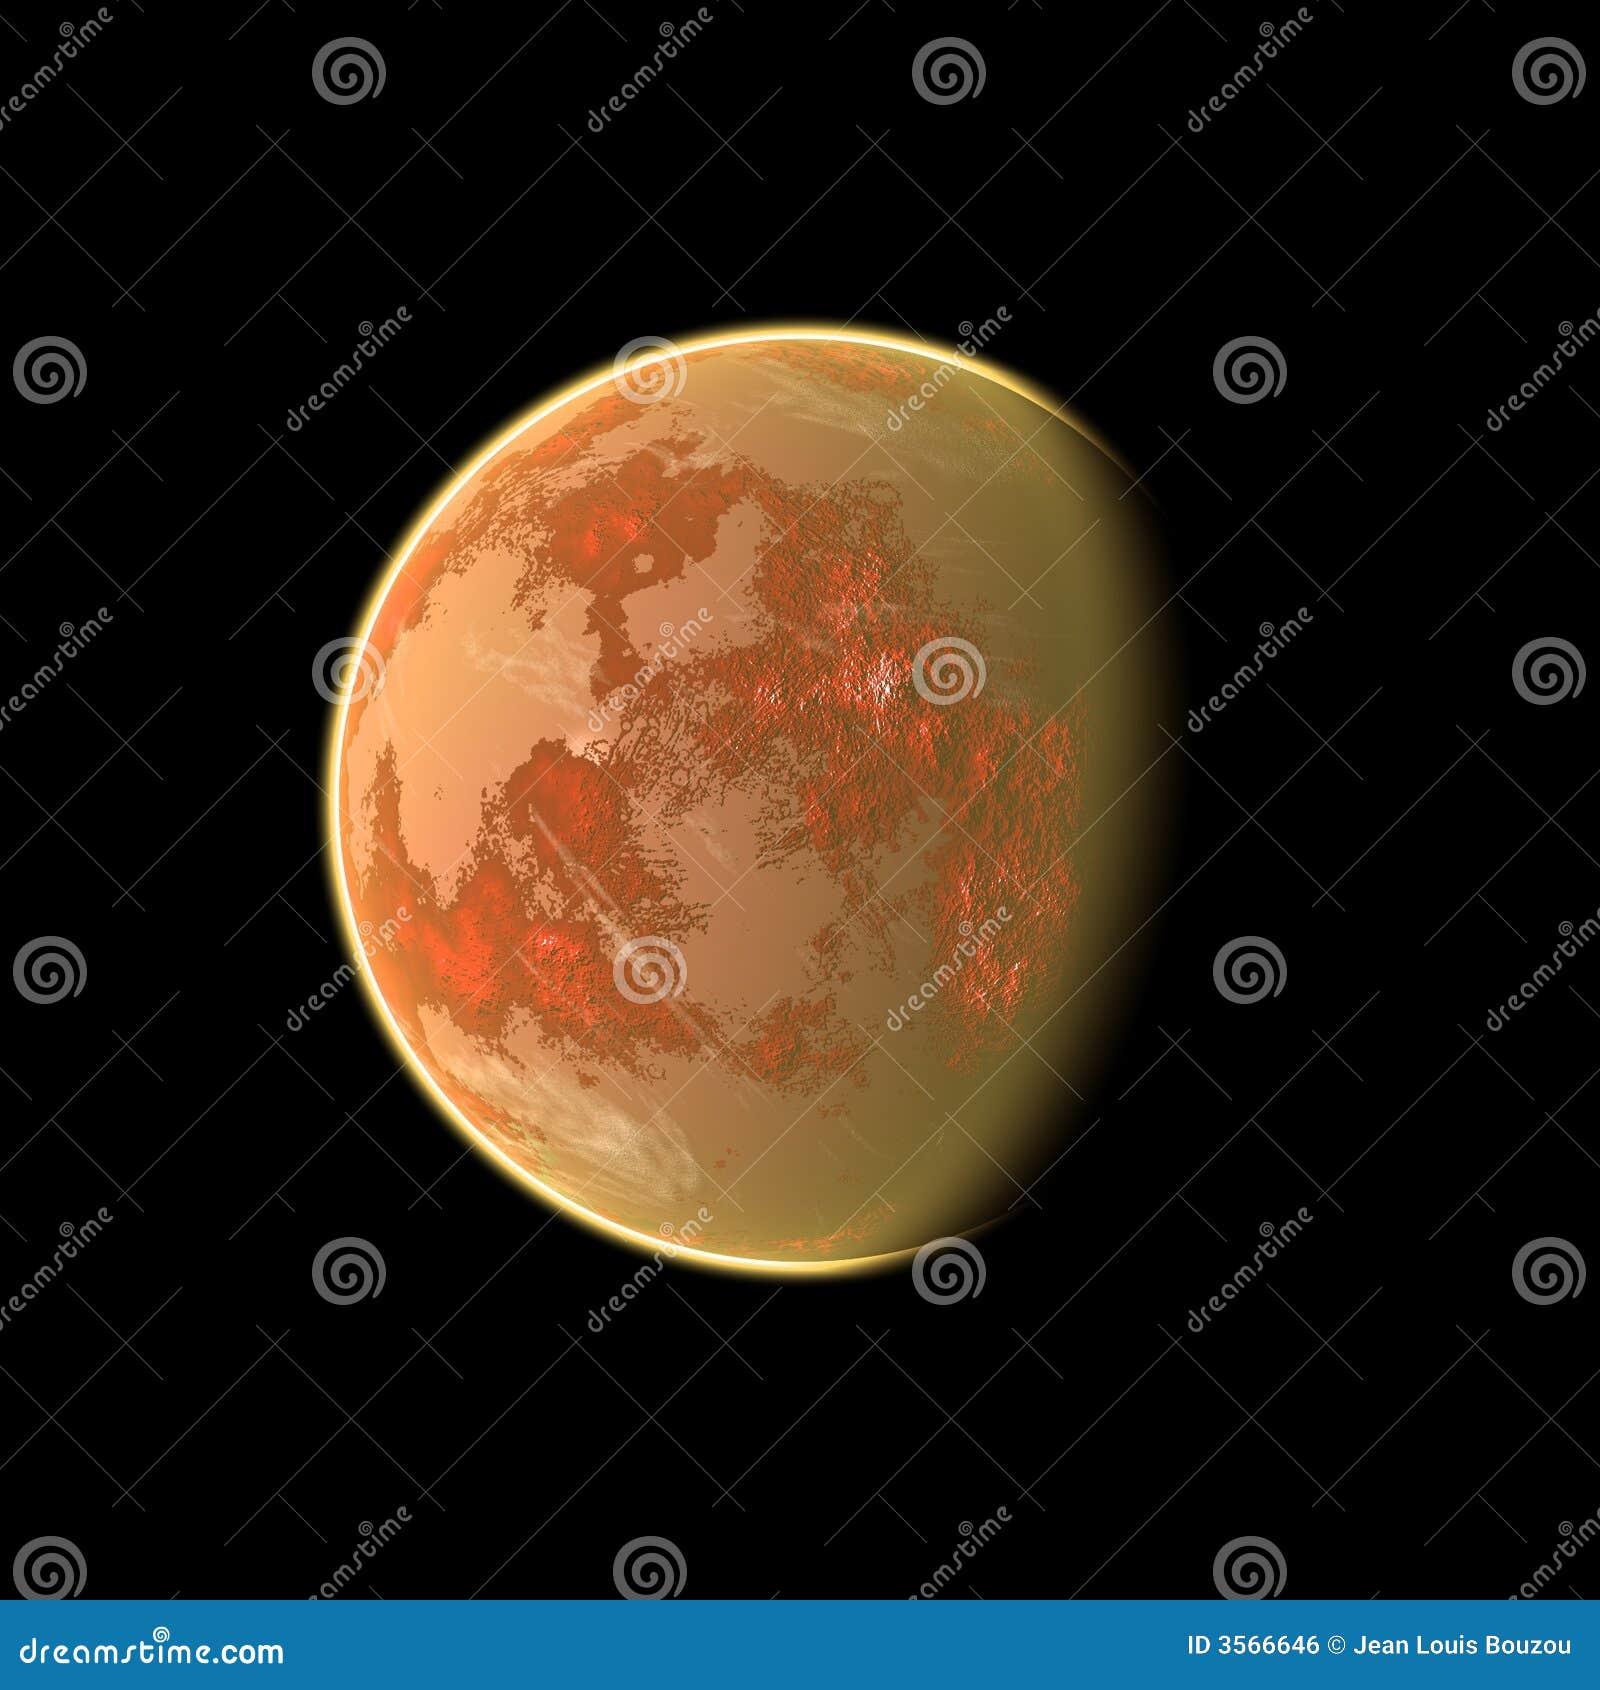 Big Orange Planet Web Design